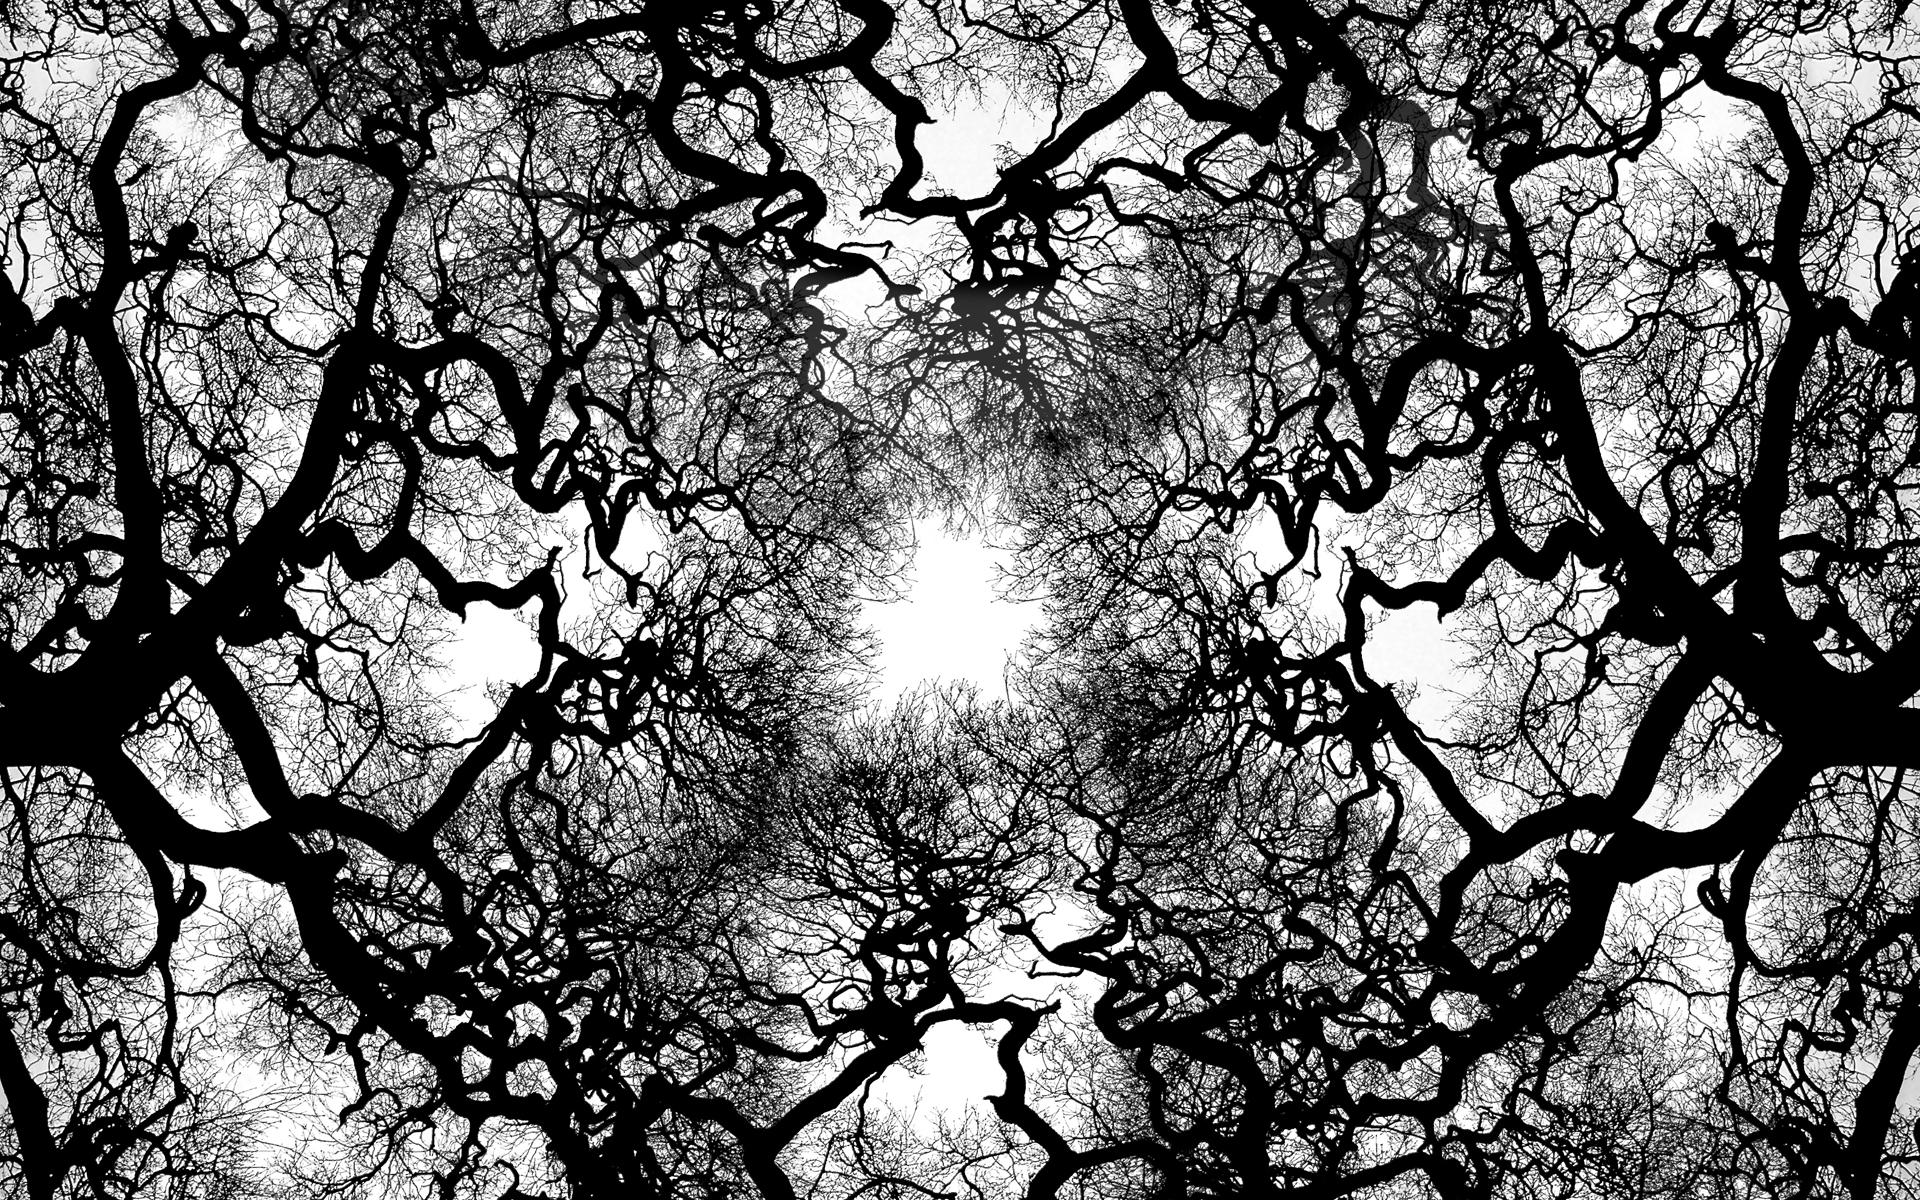 Tree_veins